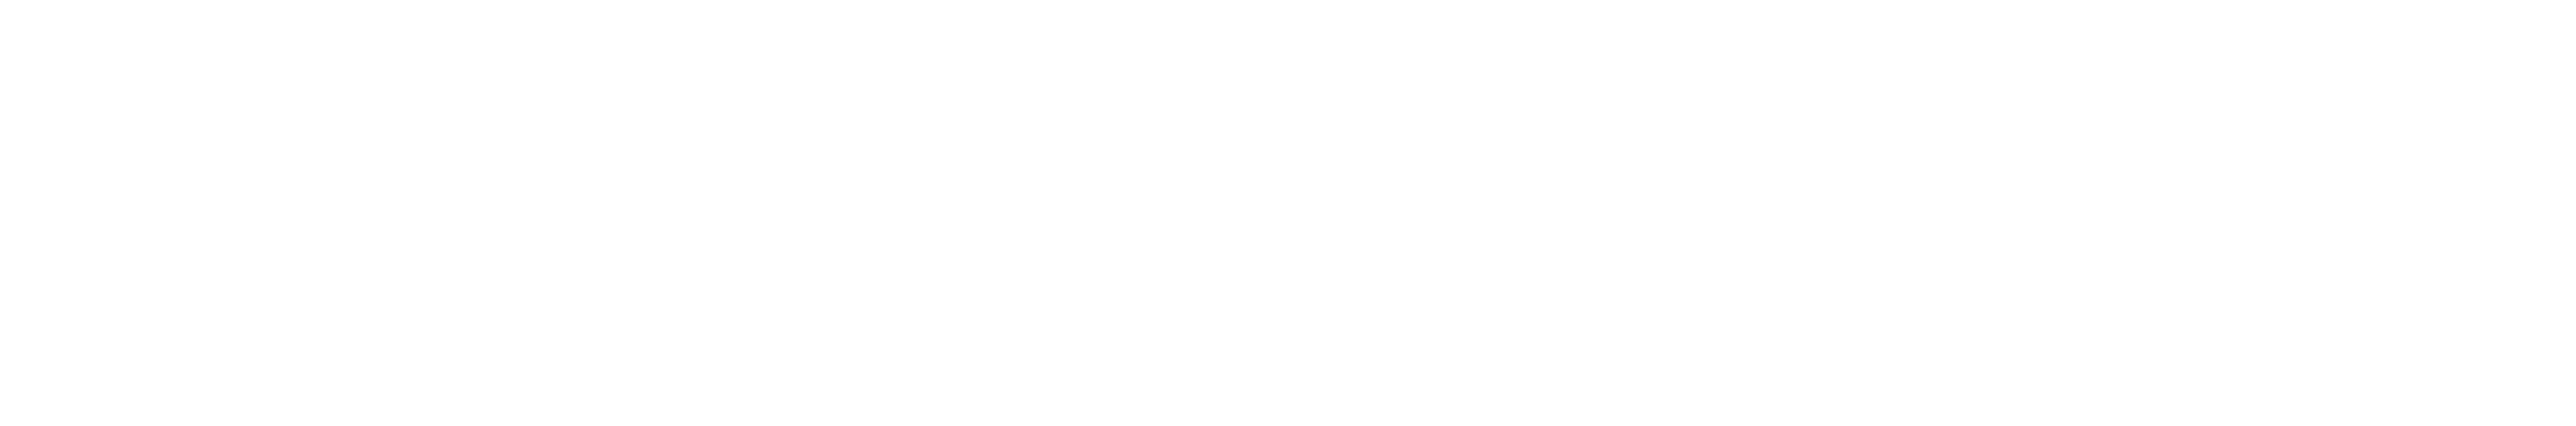 PhotoIreland